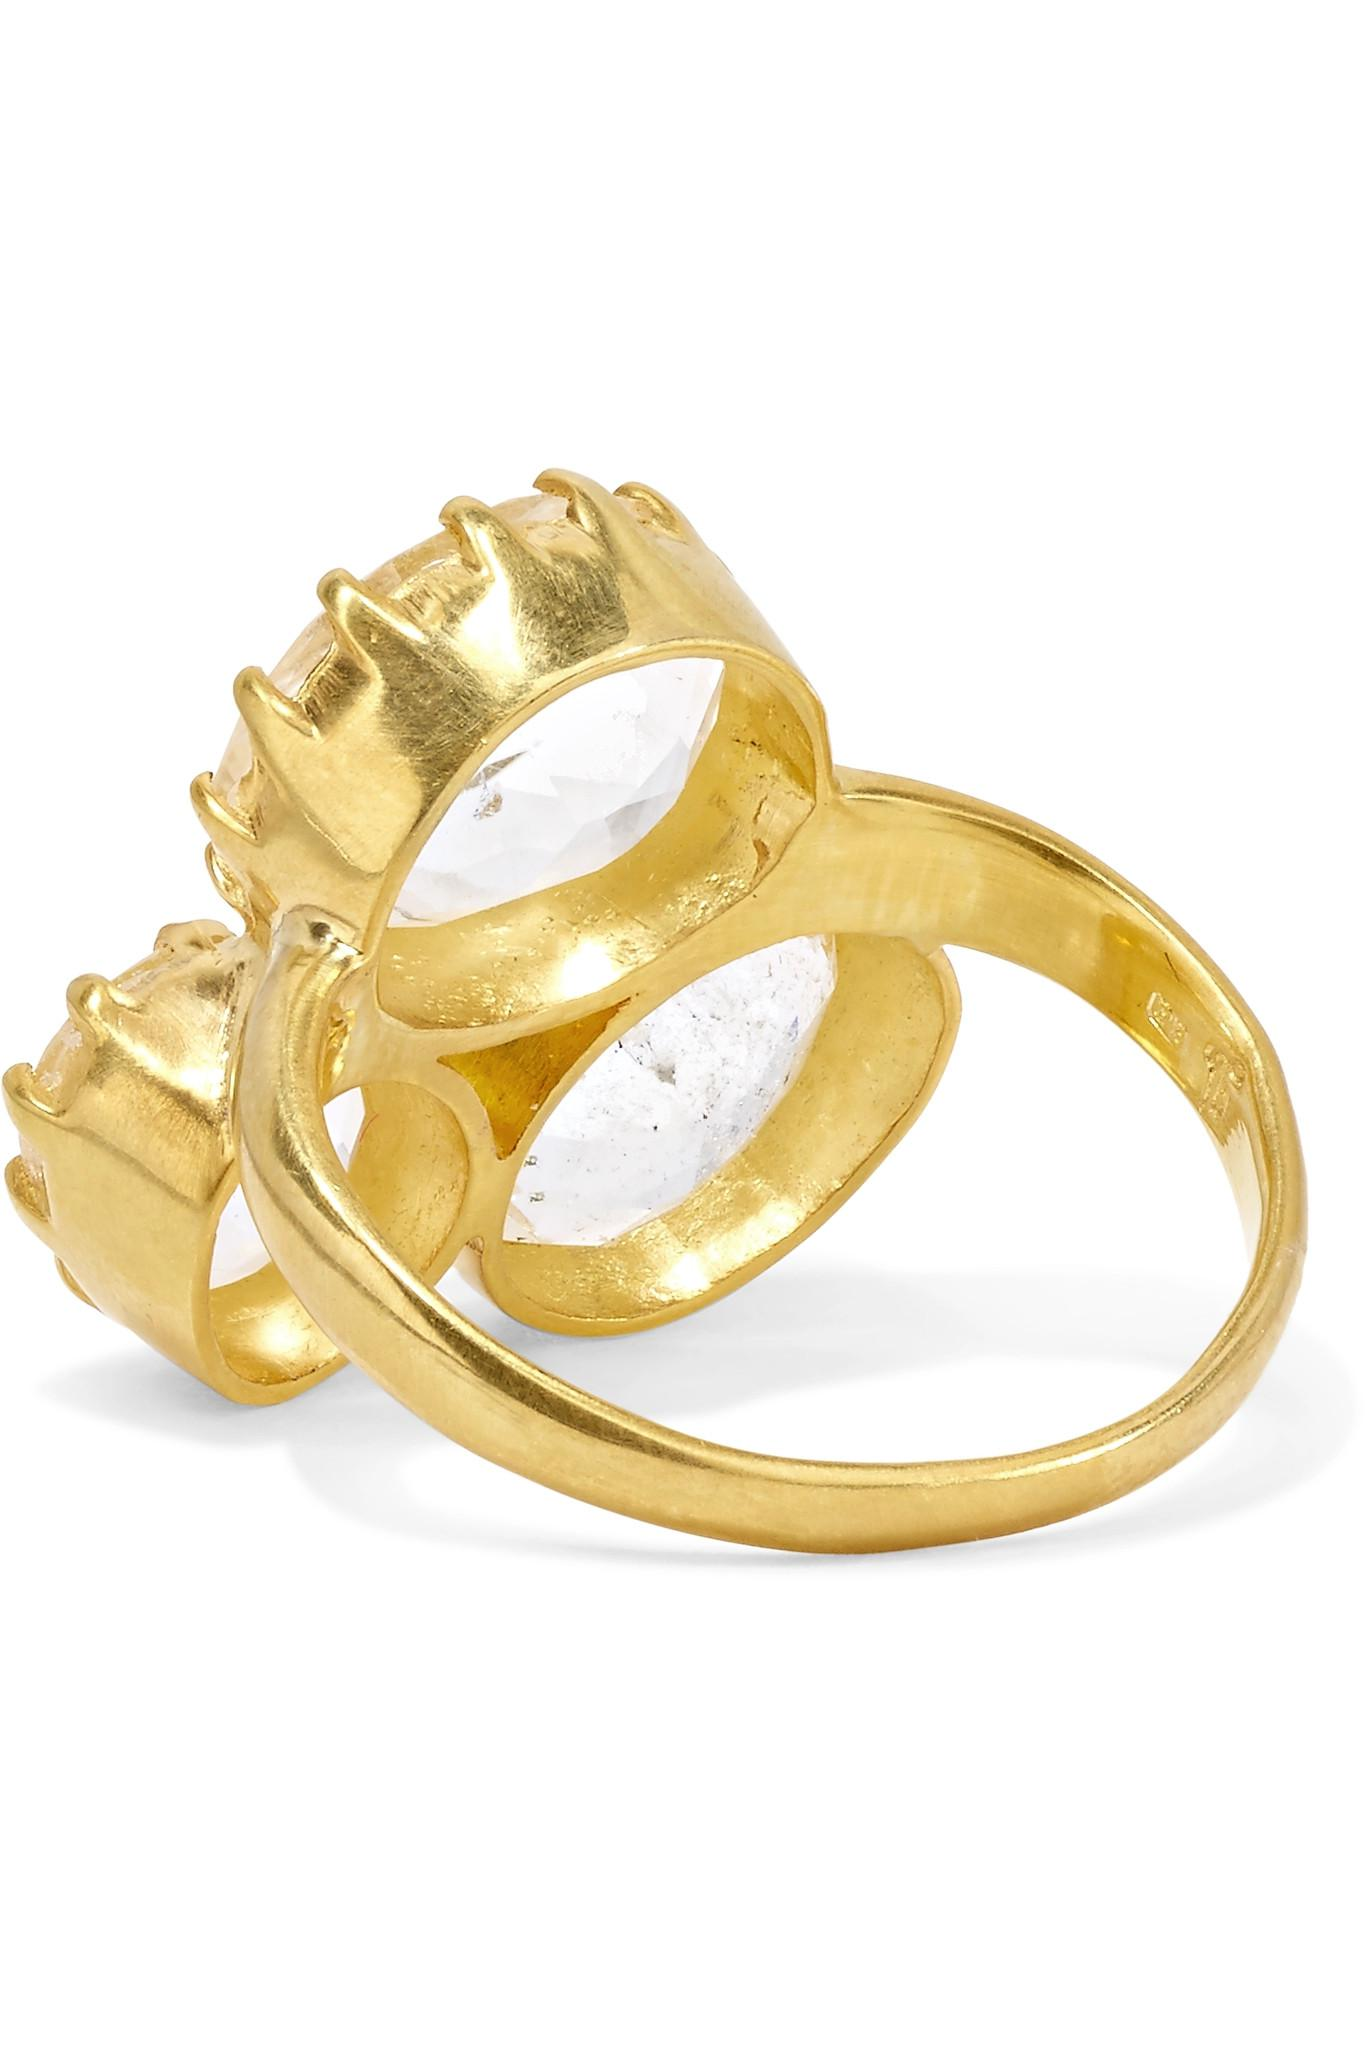 Pippa Small 18-karat Gold Diamond Ring sxcNlh